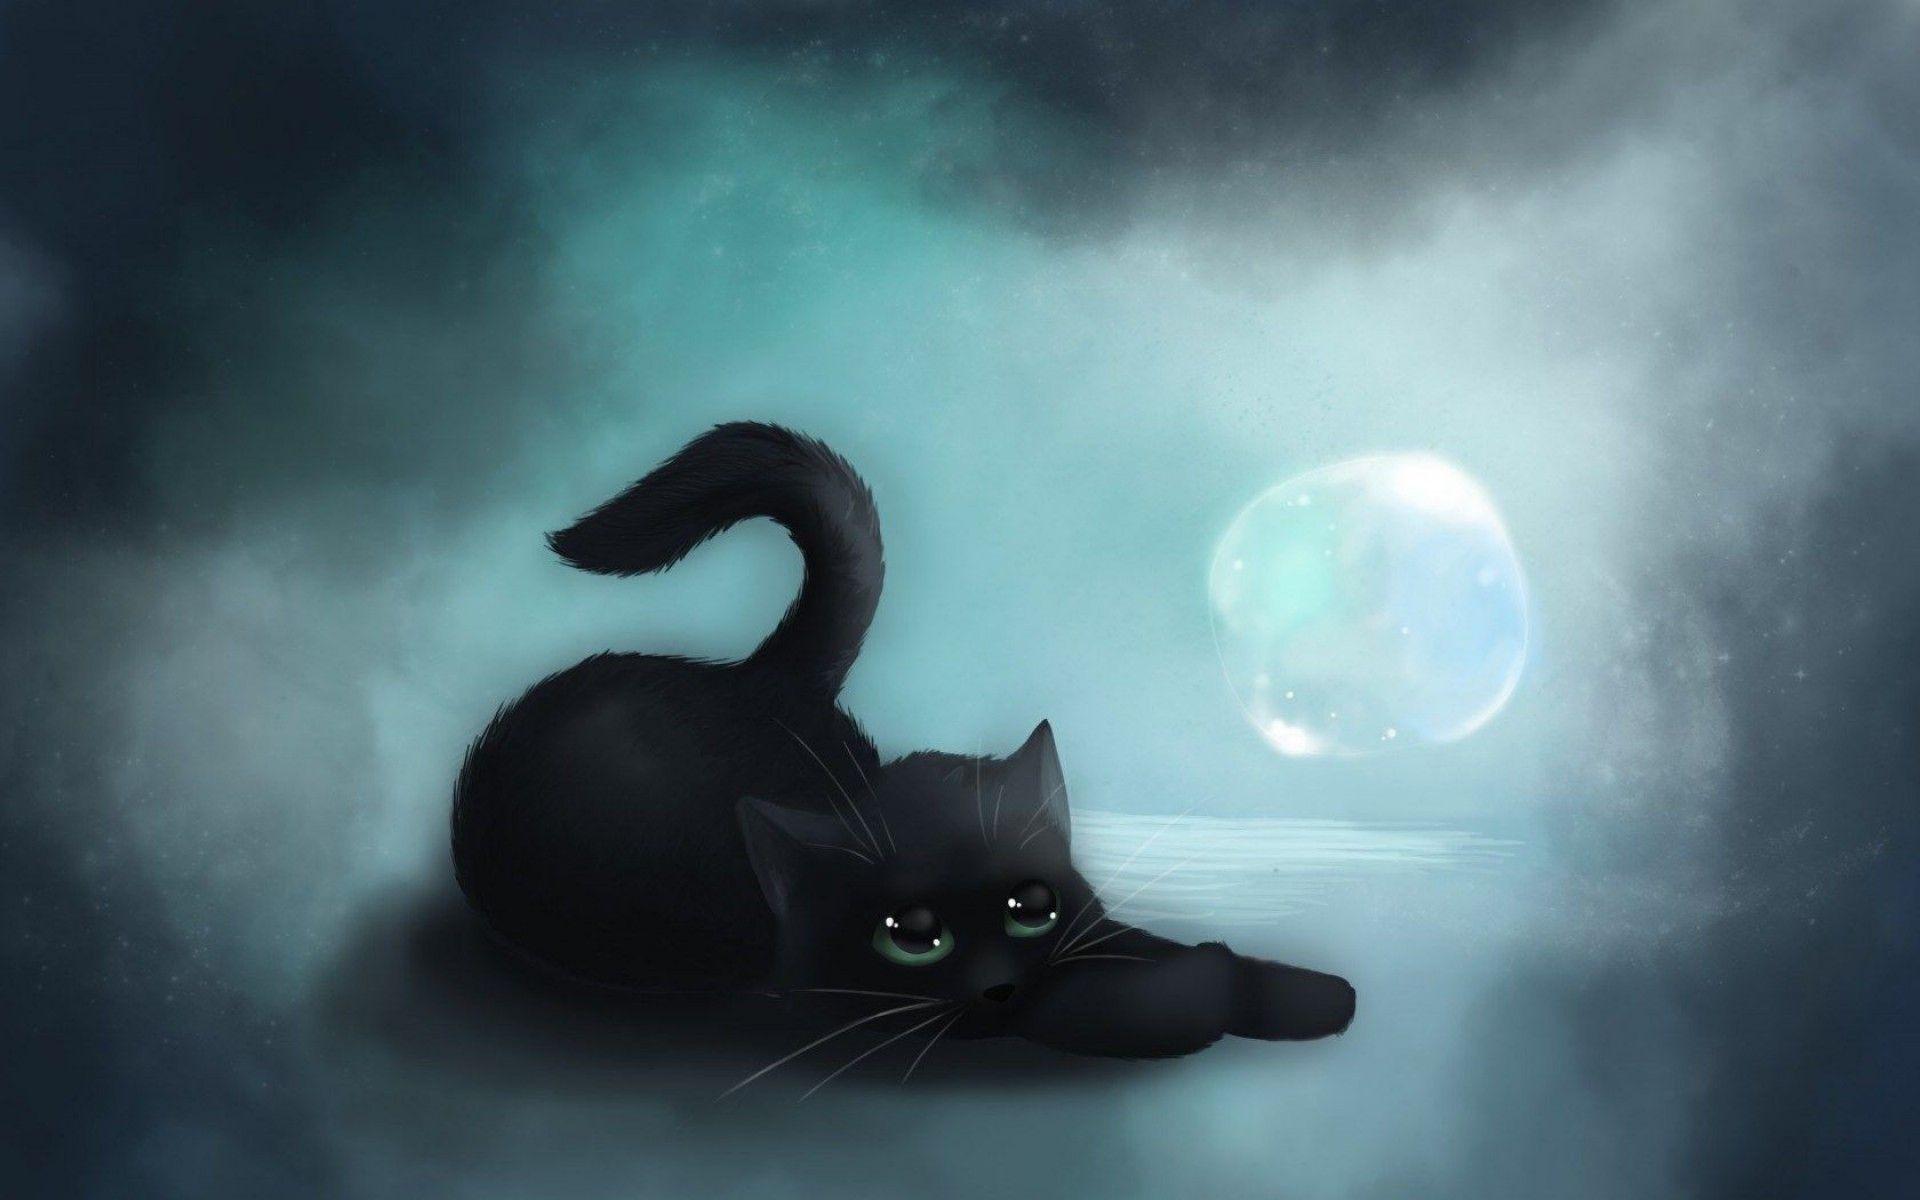 pincrystal takemoto on cats black as the night | pinterest